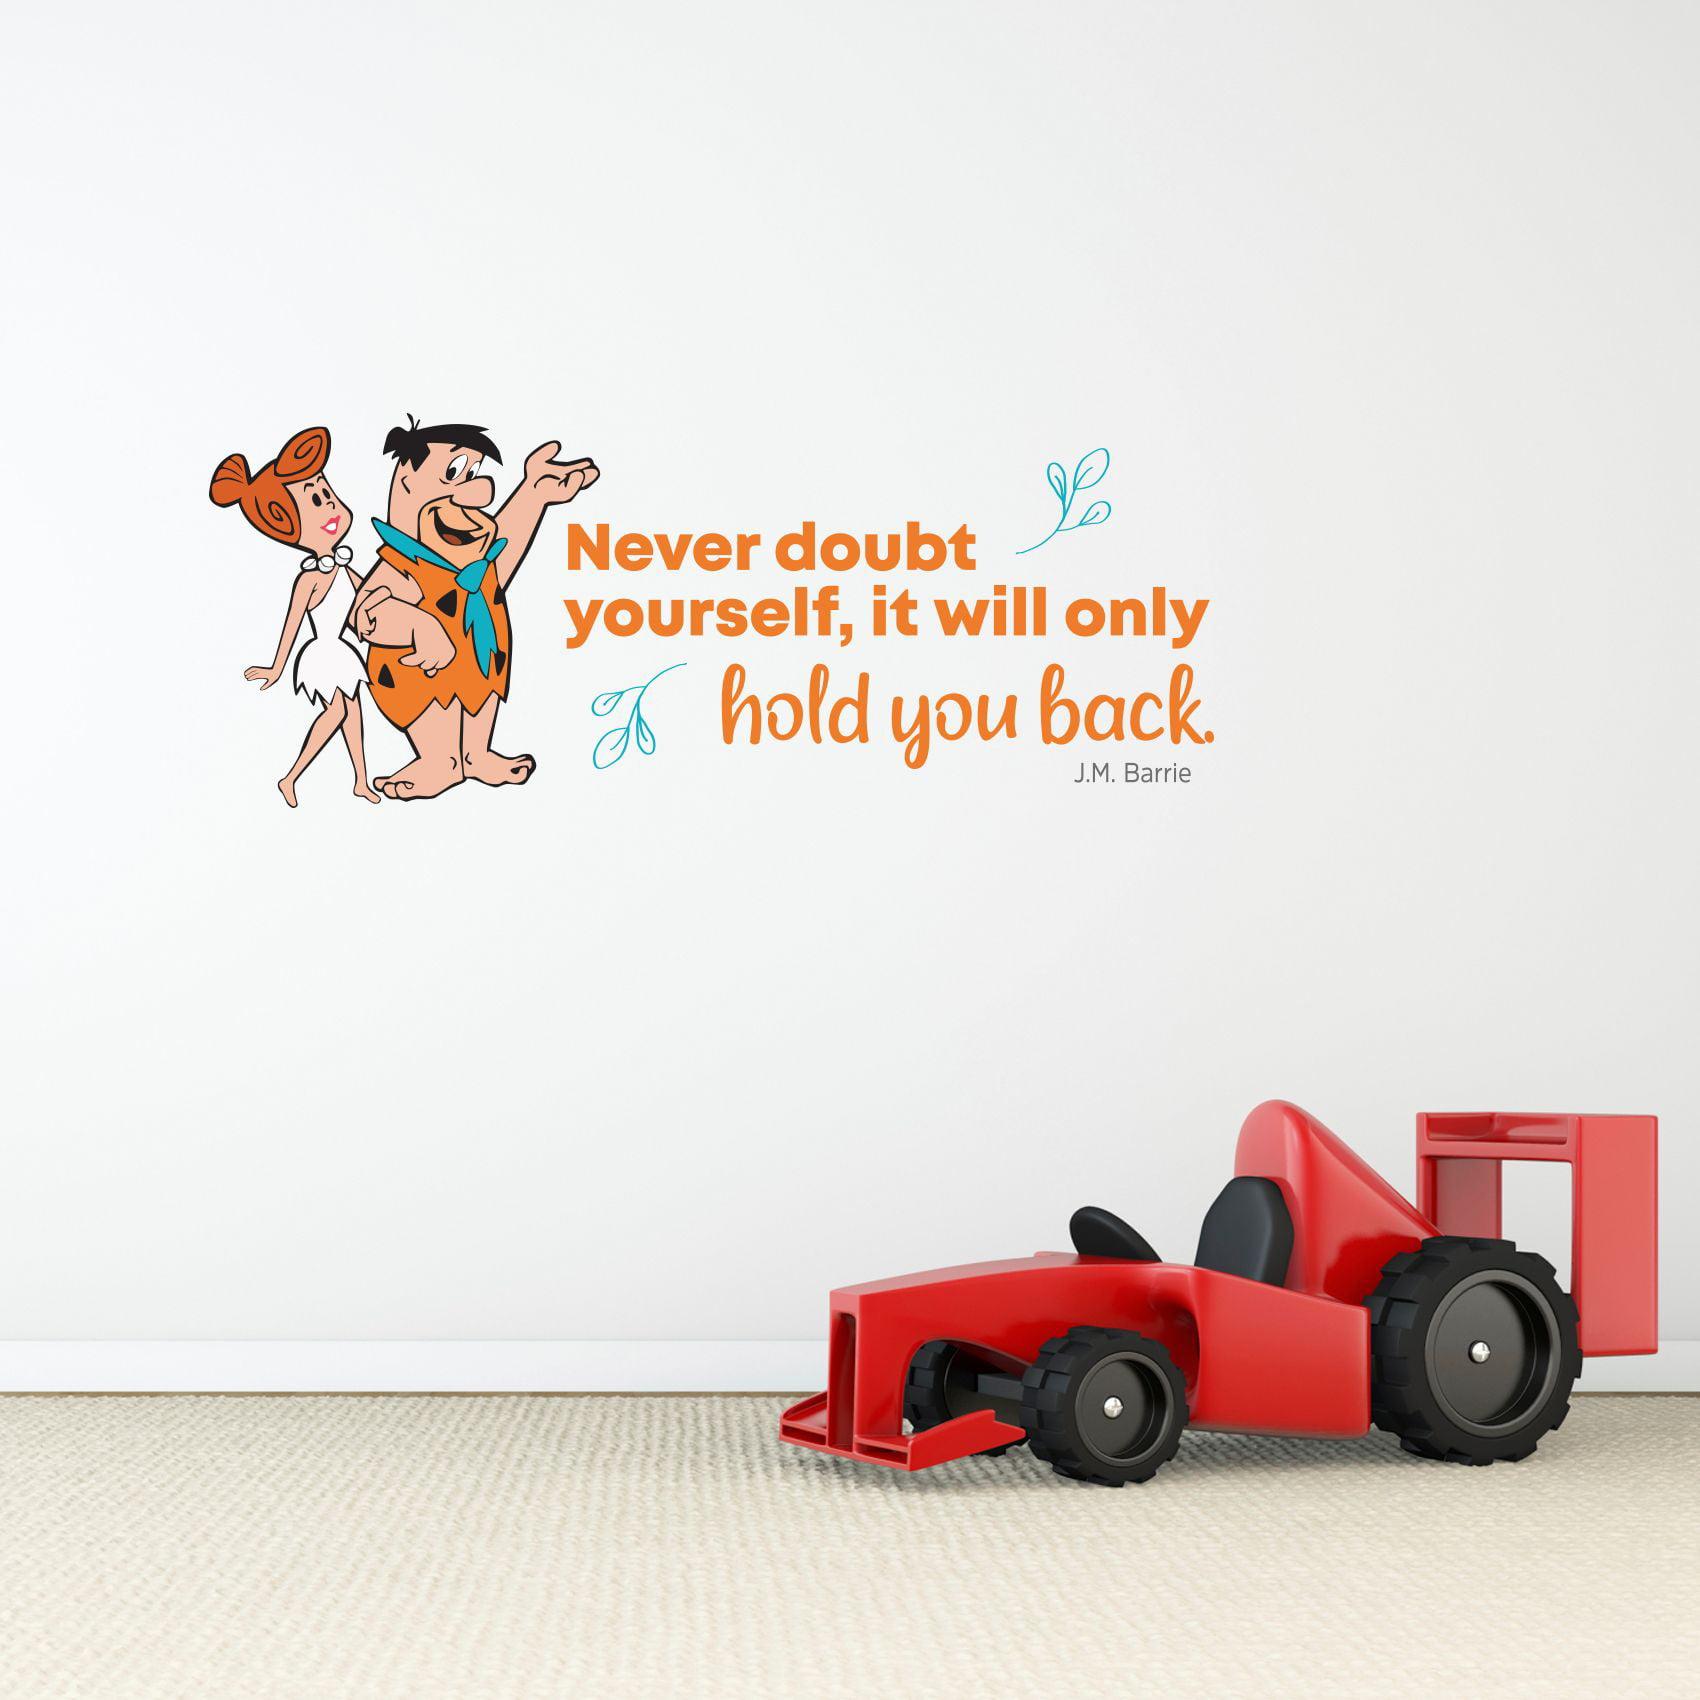 Never Doubt Flintstones Life Quote Cartoon Quotes Decors Wall Sticker Art Design Decal For Girls Boys Kids Room Bedroom Nursery Kindergarten Home Decor Stickers Wall Art Vinyl Decoration 15x30 Inch Walmart Com